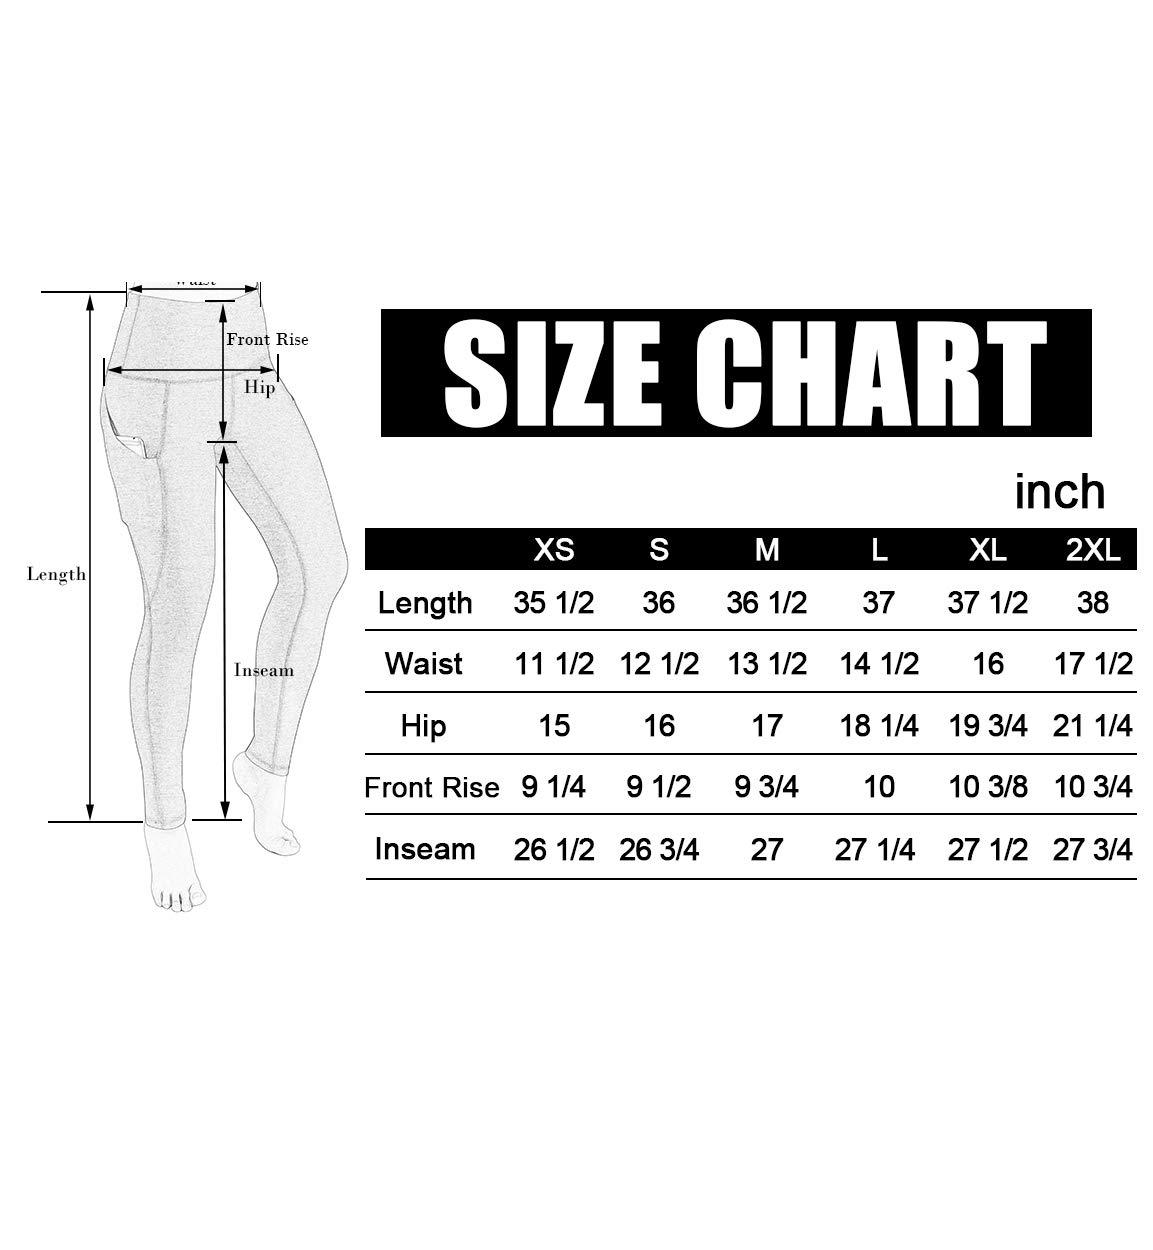 ODODOS High Waist Out Pocket Yoga Pants Tummy Control Workout Running 4 Way Stretch Yoga Leggings,Black,Medium by ODODOS (Image #7)